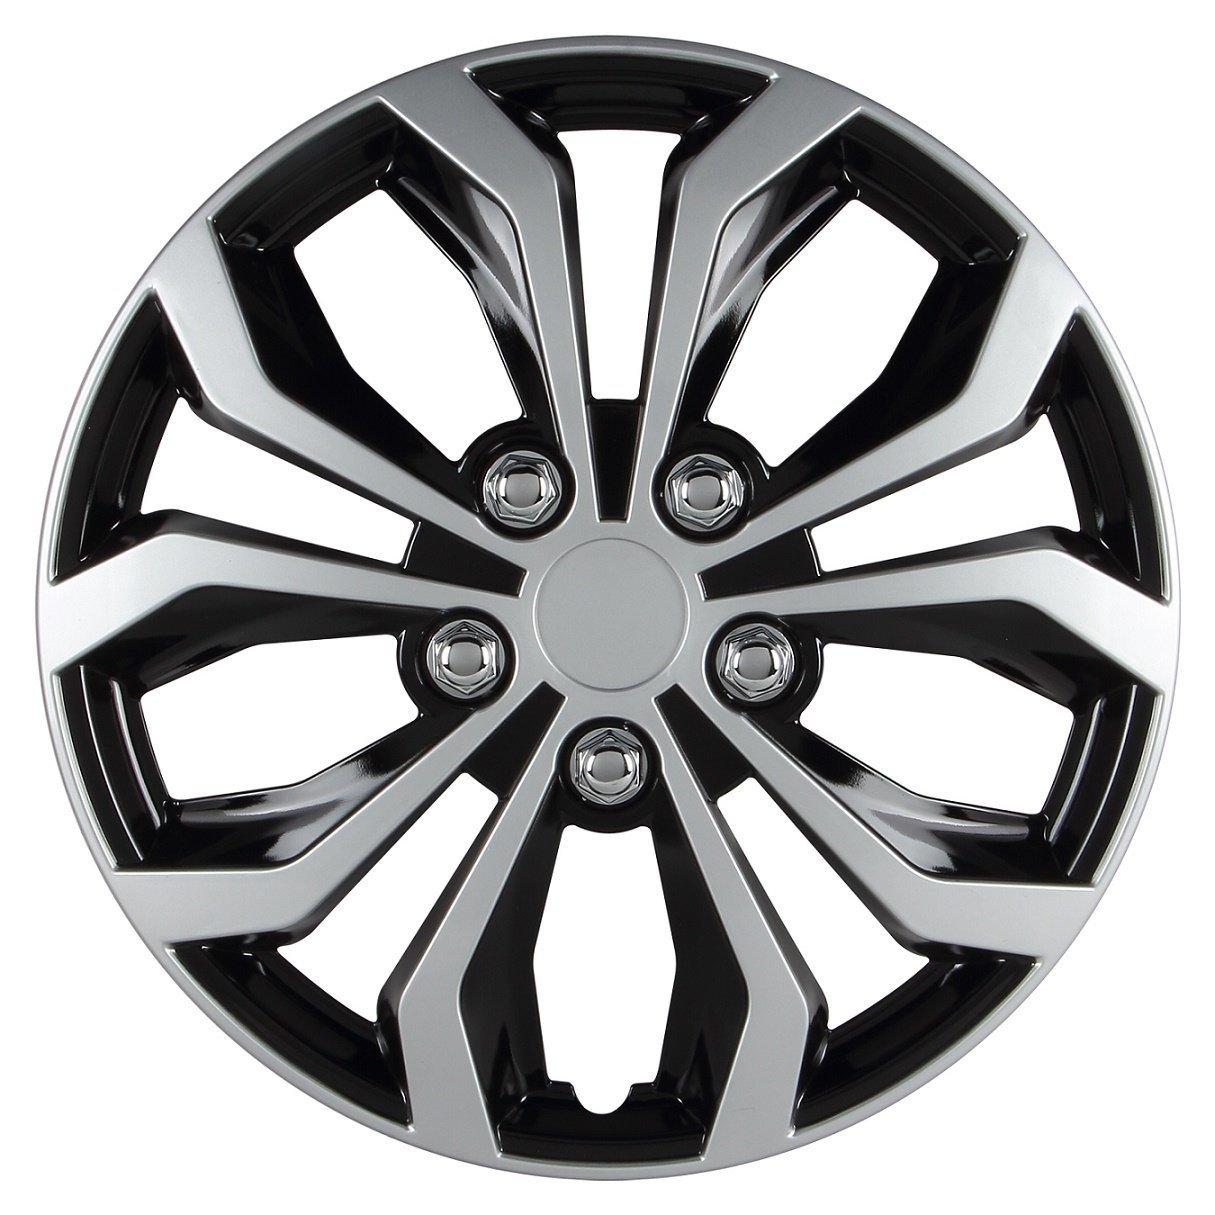 Pilot Hubcap Wheel, Black And Silver Universal Spyder Per...